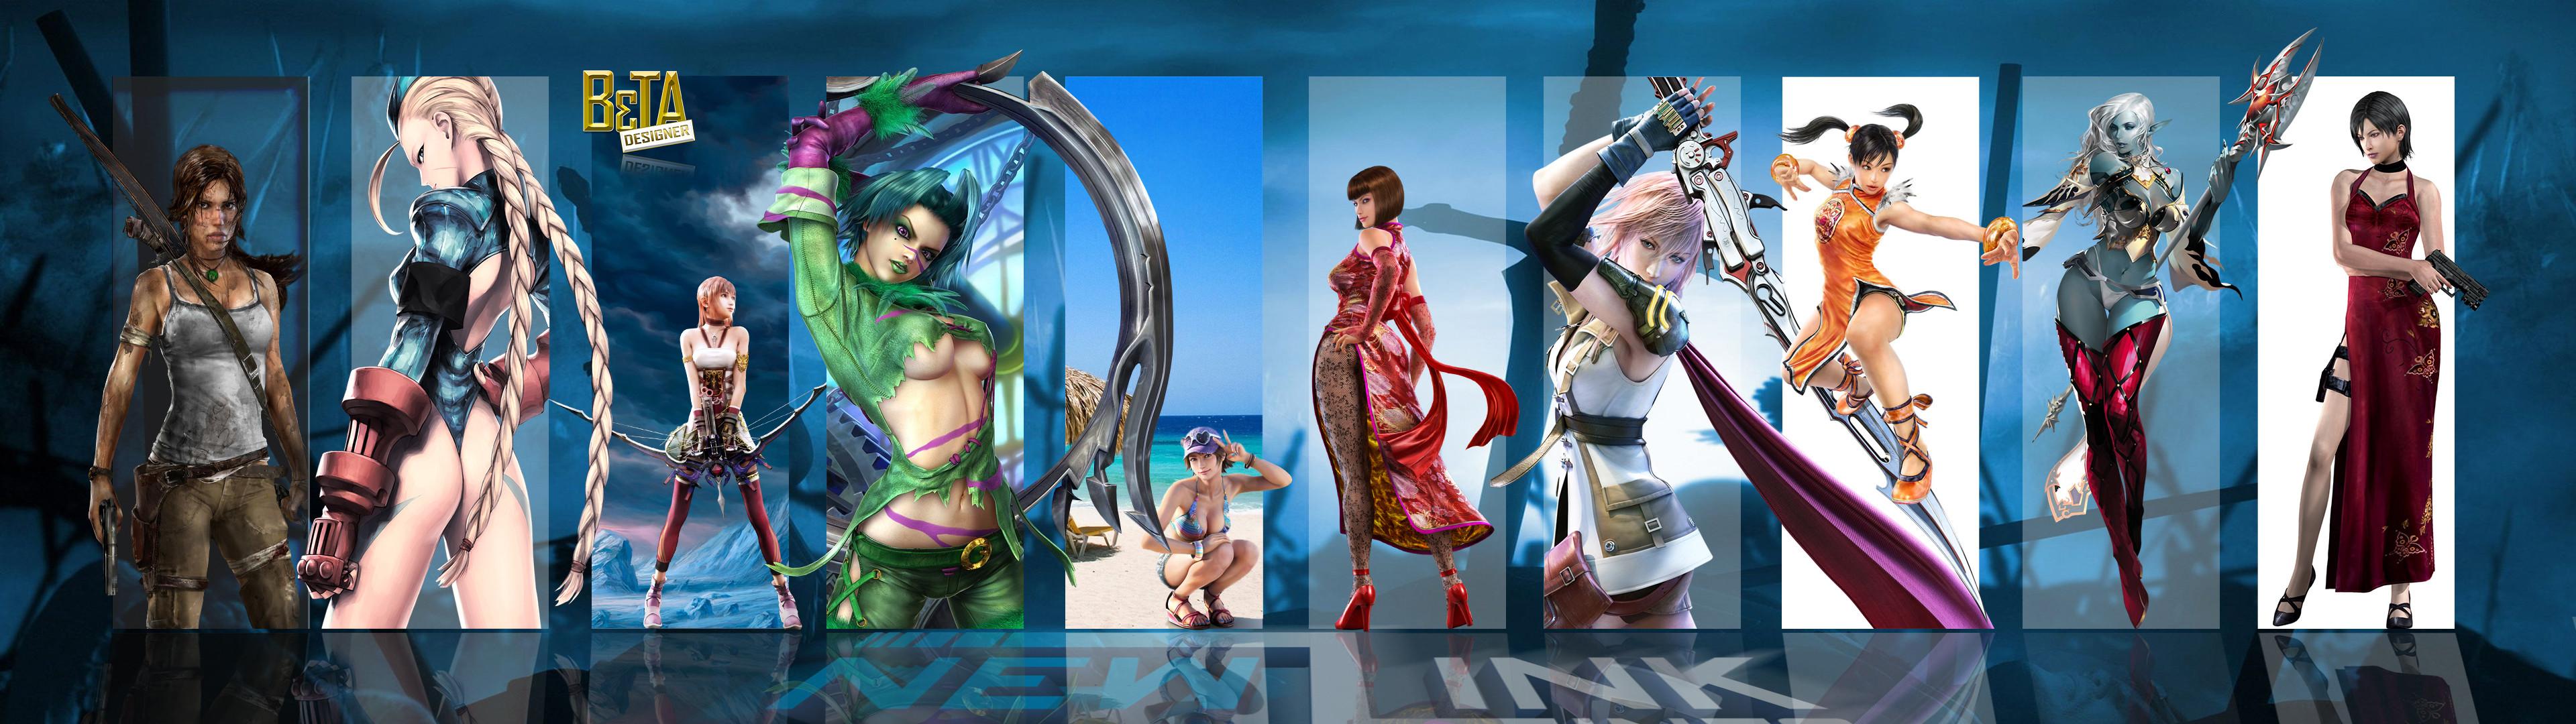 New Link Games: Top Musas dos Games – Wallpaper 01